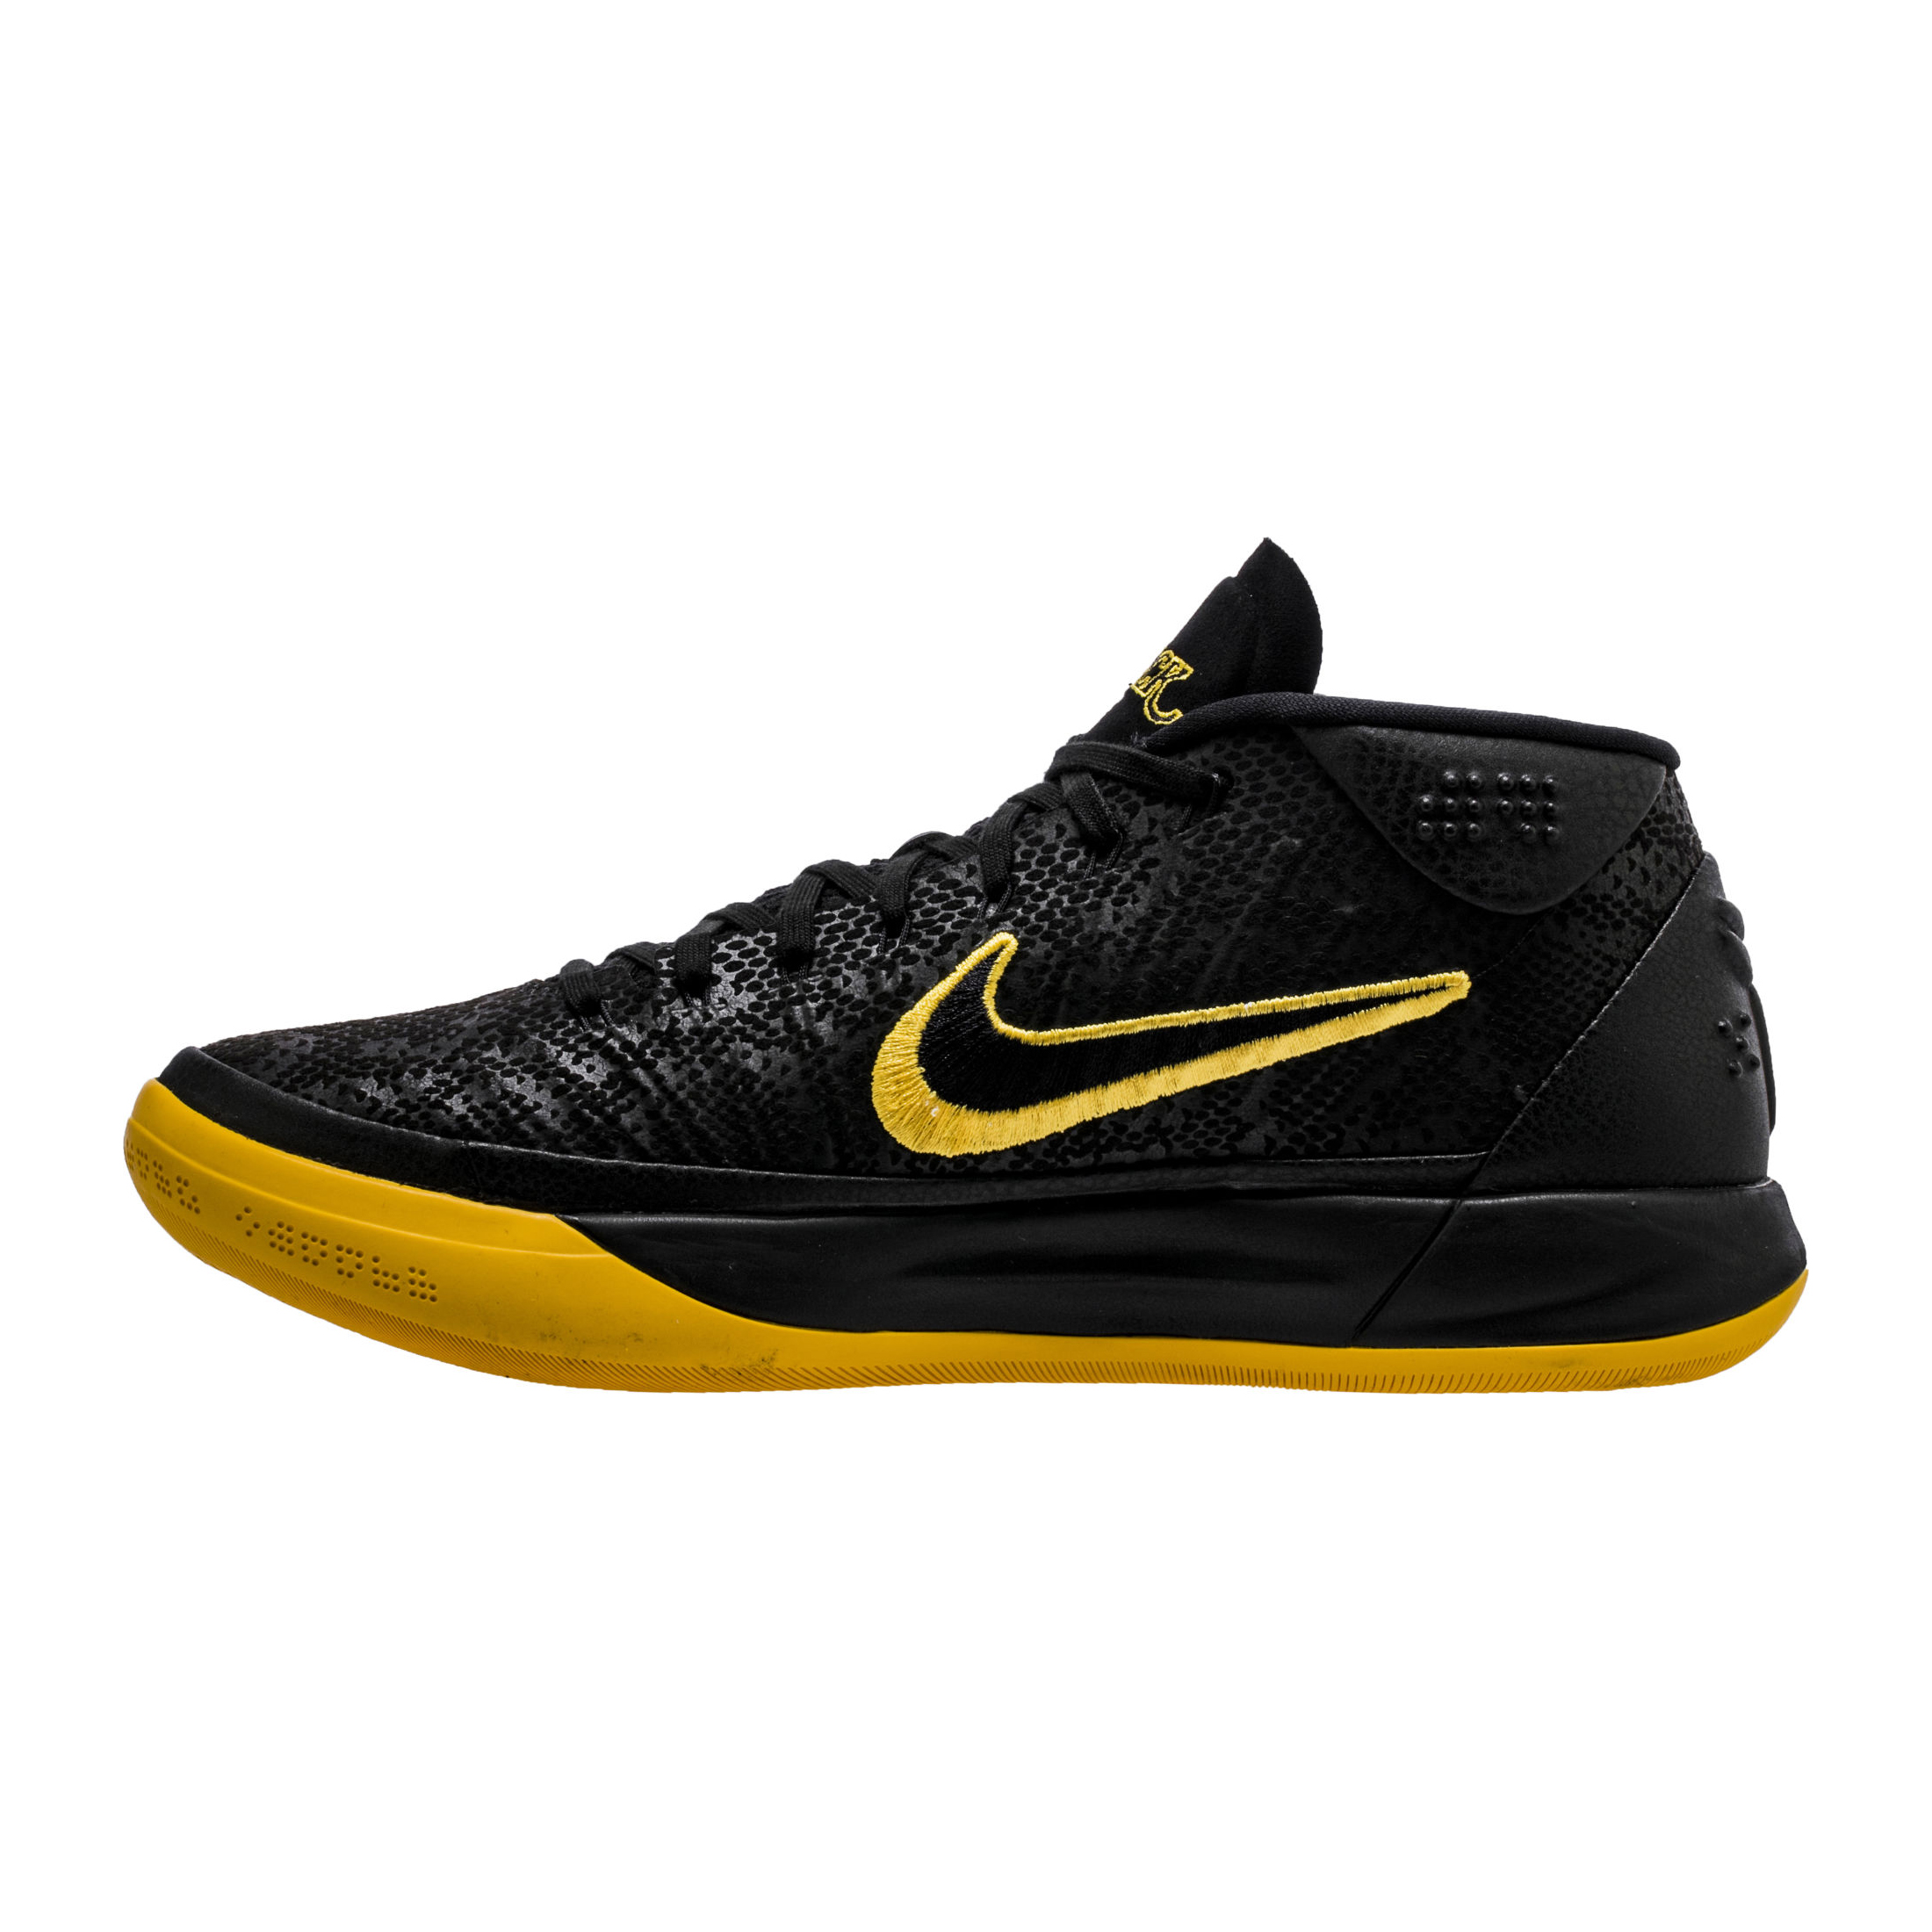 Nike Kobe AD Black Mamba City Edition 3